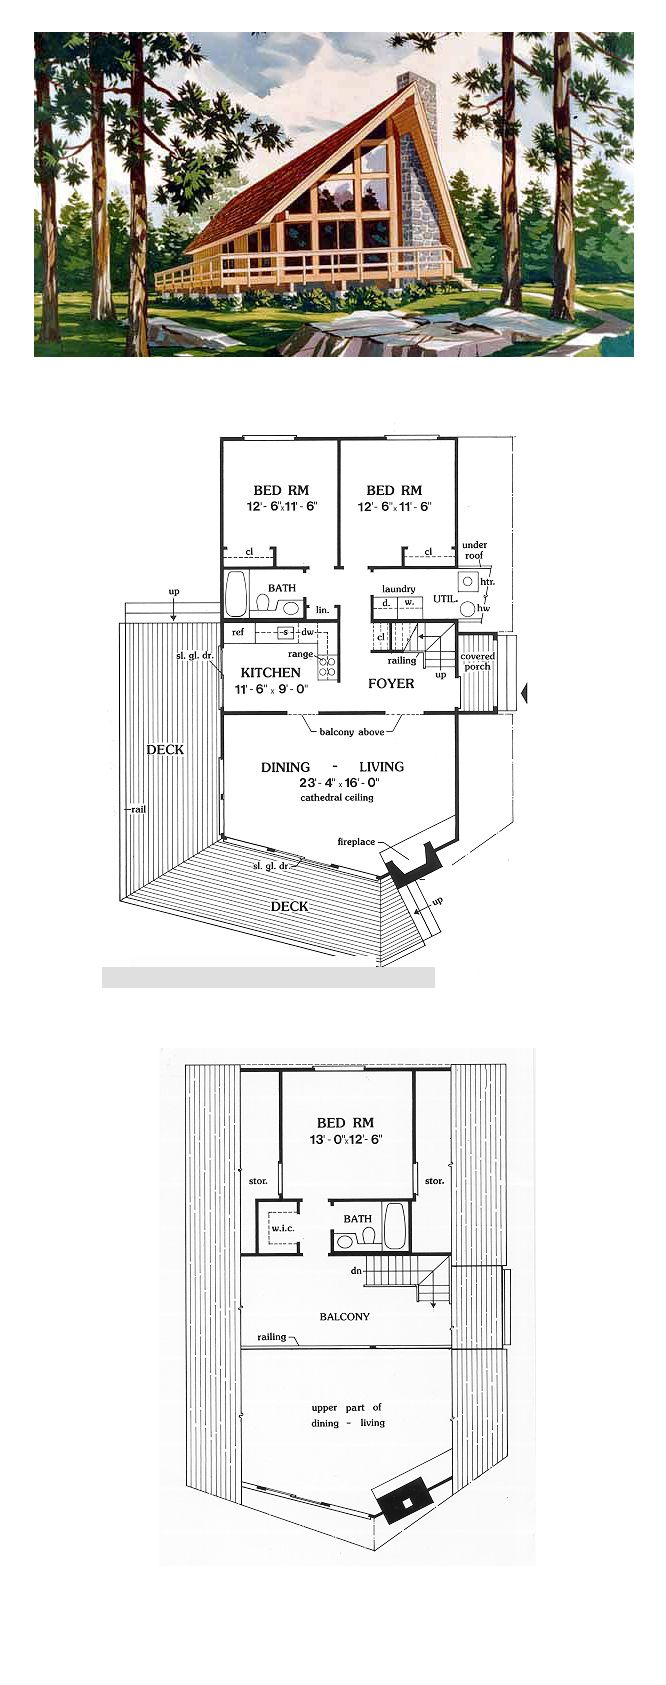 Drawn bedroom dining area Ideas Best 25+ house ideas